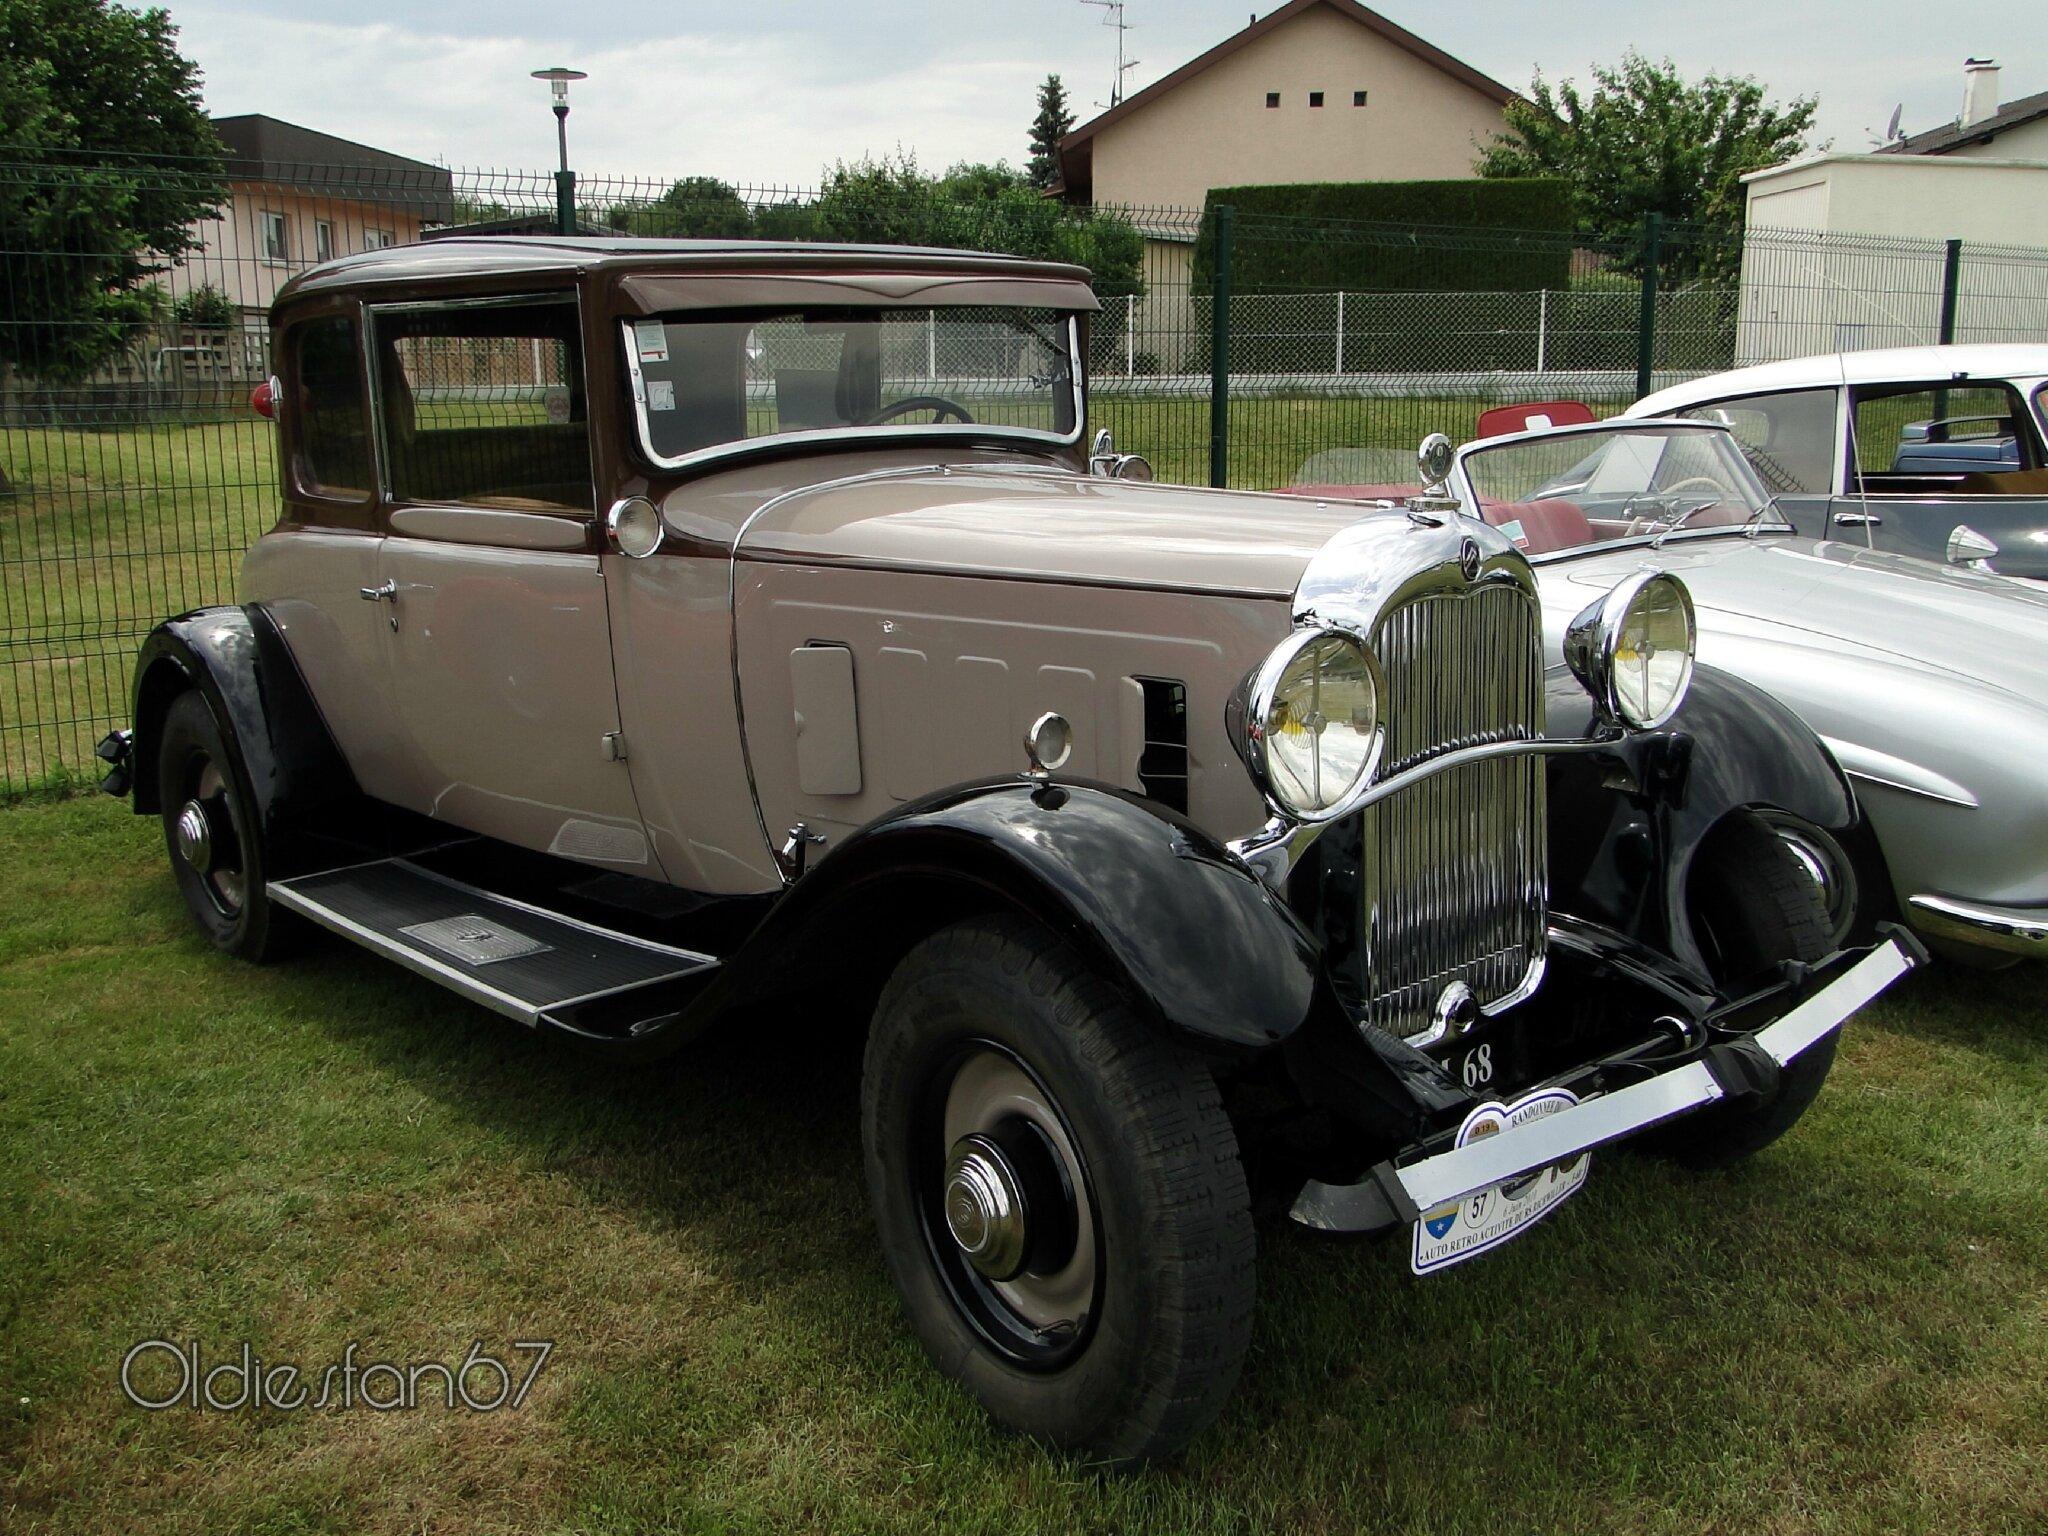 citro n c6g coup 1932 oldiesfan67 mon blog auto. Black Bedroom Furniture Sets. Home Design Ideas